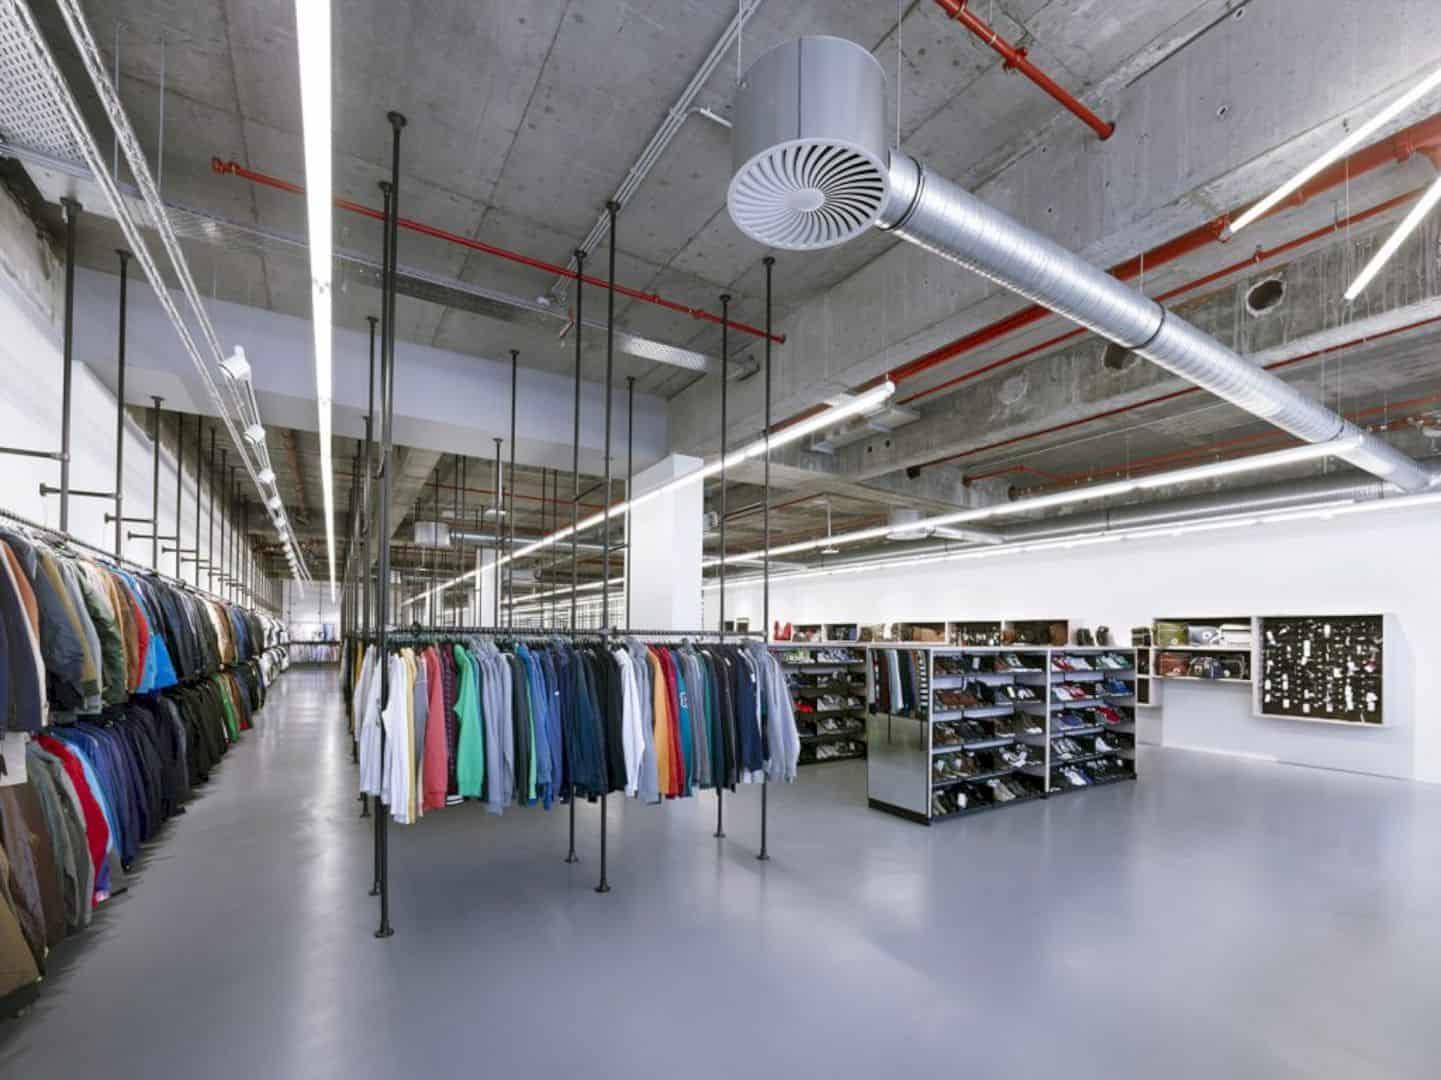 Zalando Outlet: An Online Clothing Retailer Adopting Contemporary Loft-Like Environment